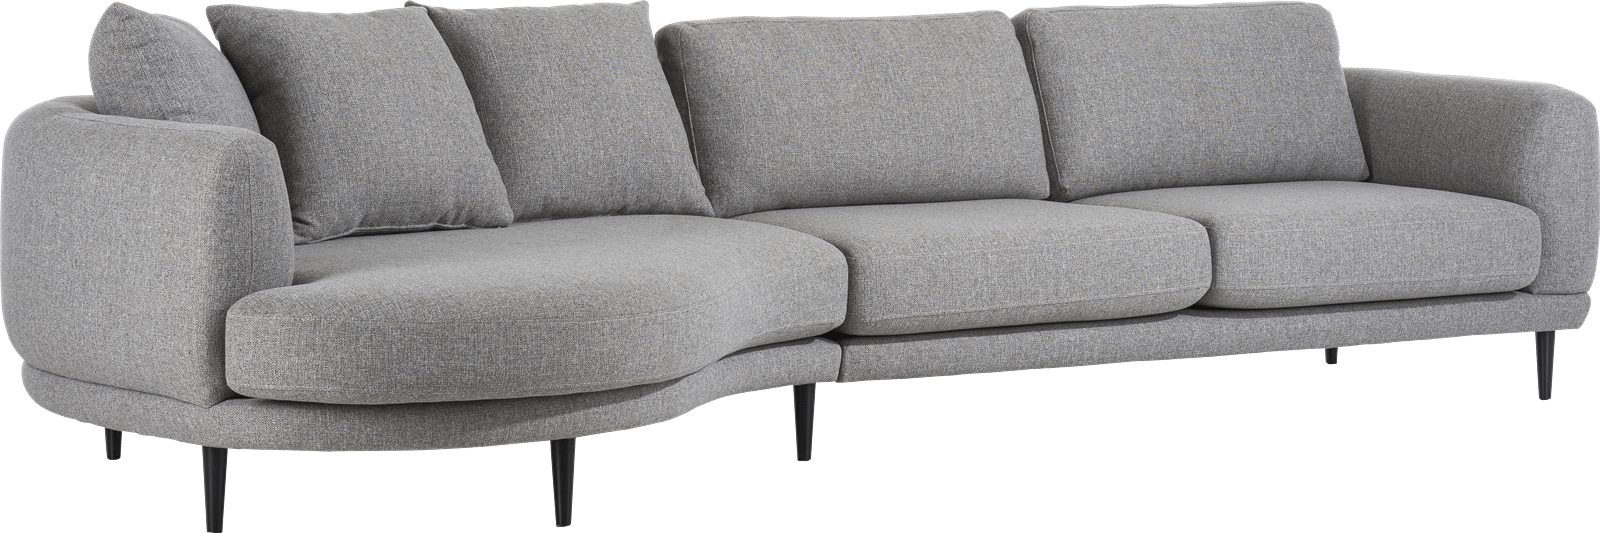 H&H - Portland - Moderne - lounge end 3 coussin big inclus - rond - gauche